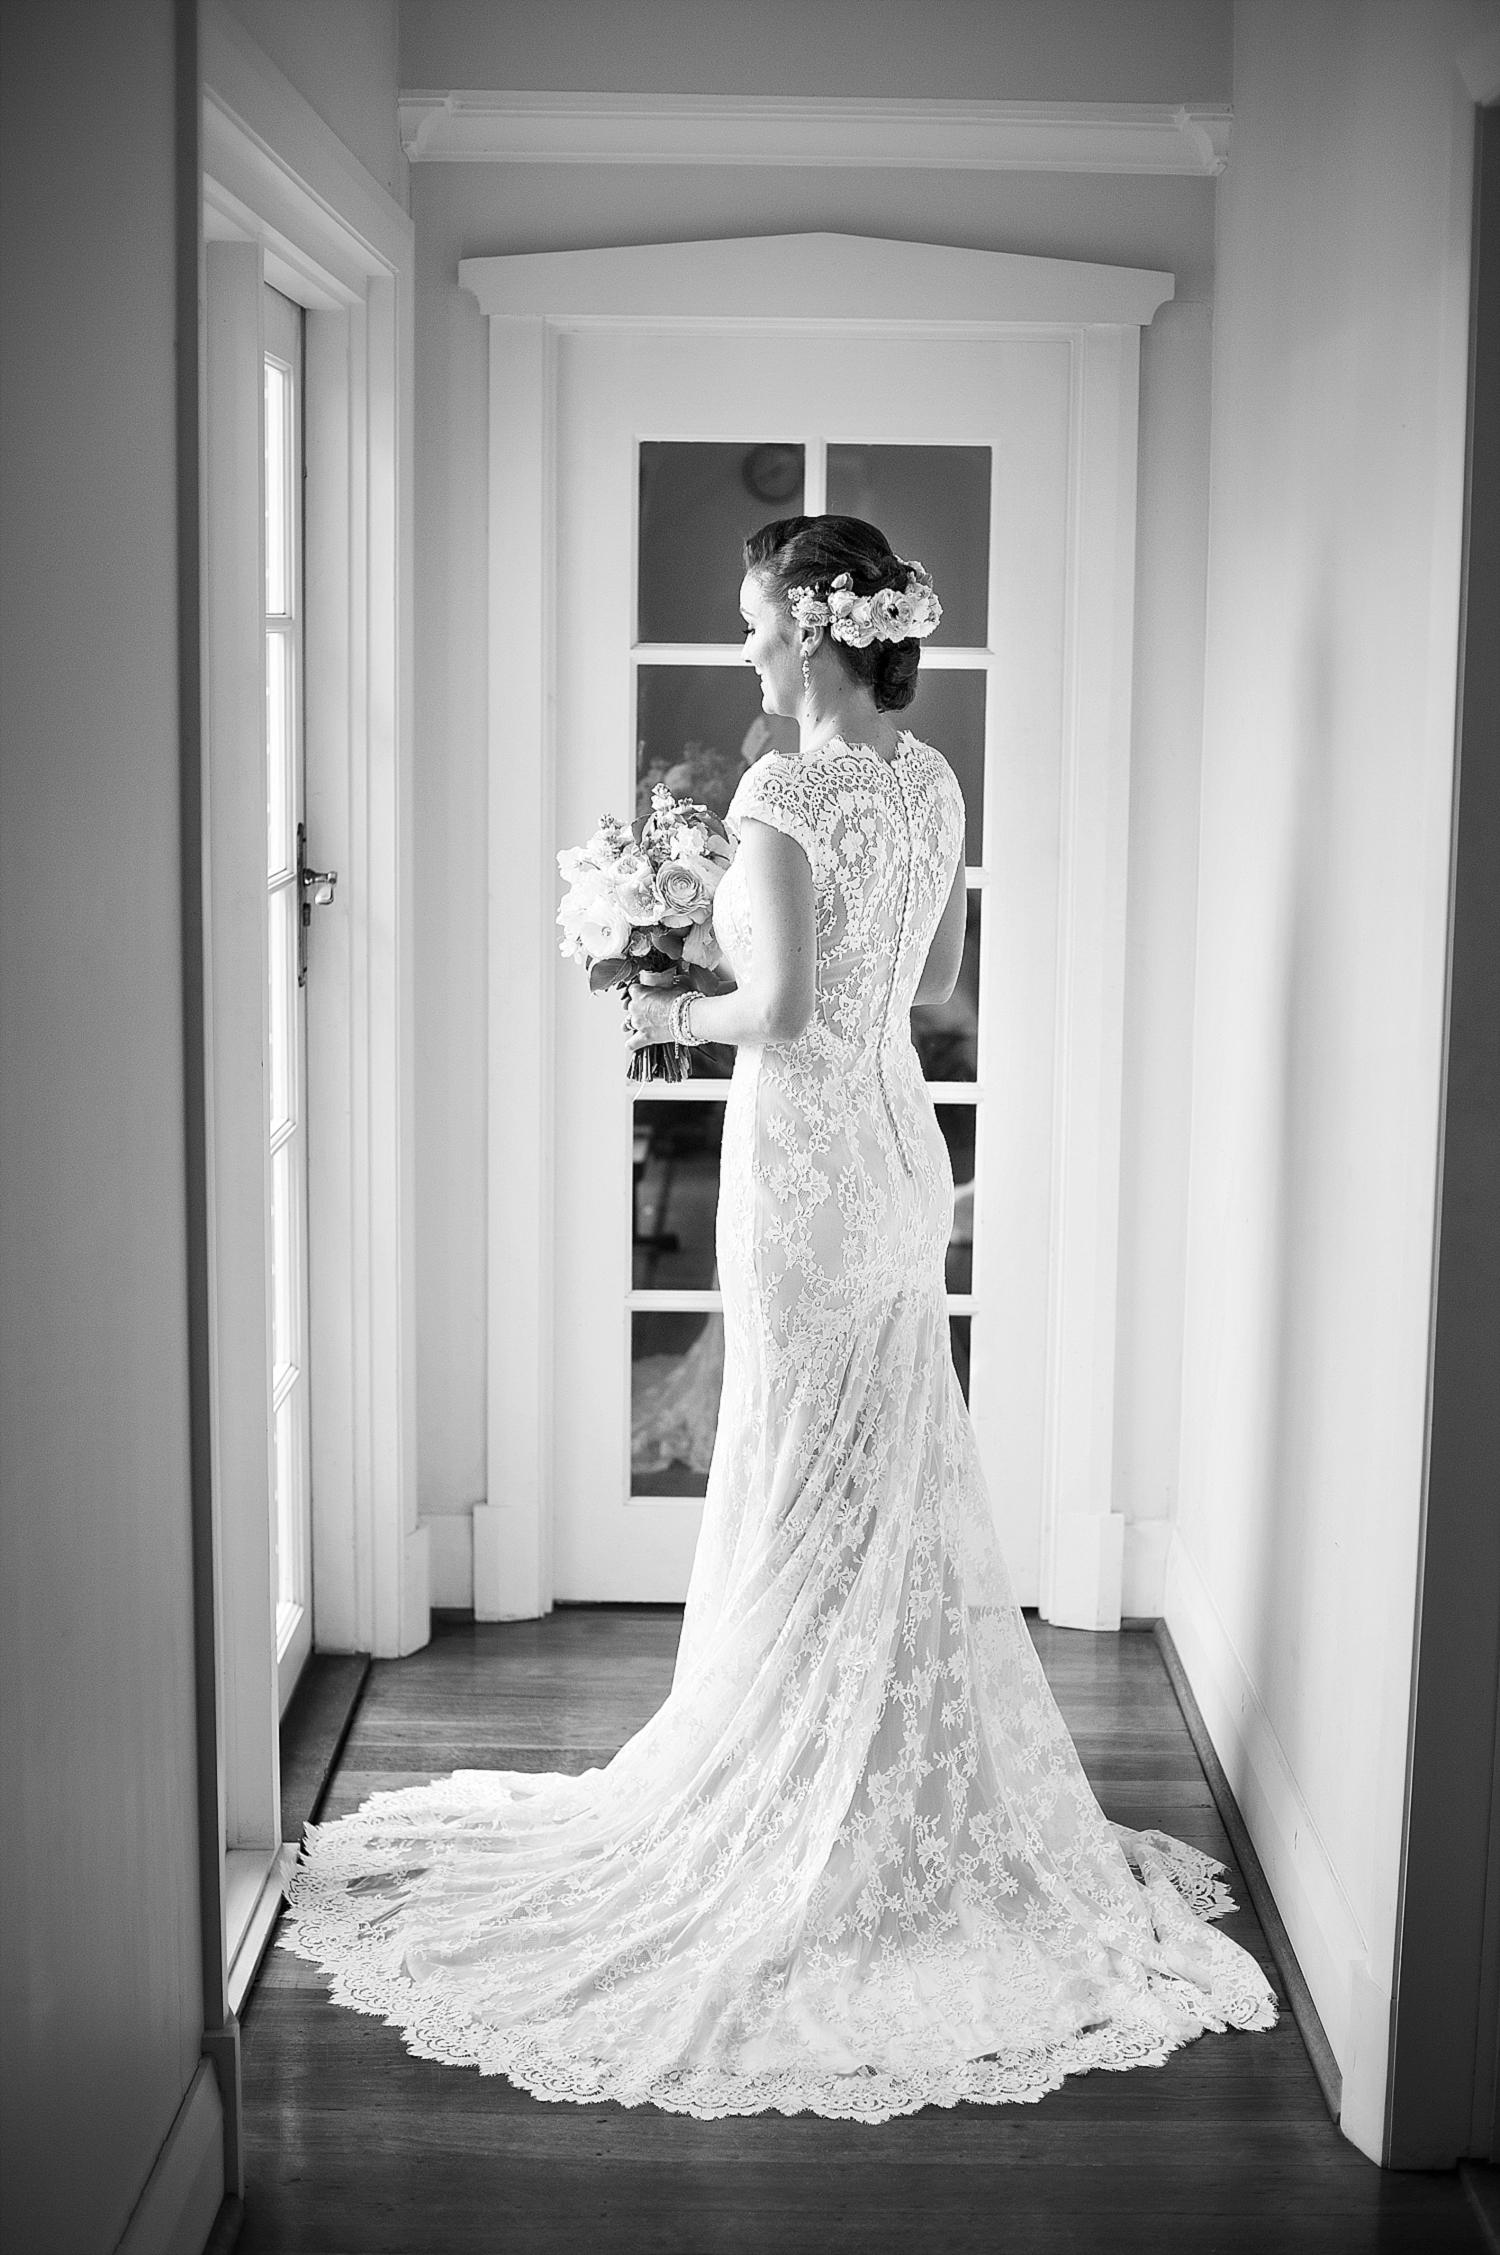 20 back of lace wedding dress wedding photography perth 020.jpg